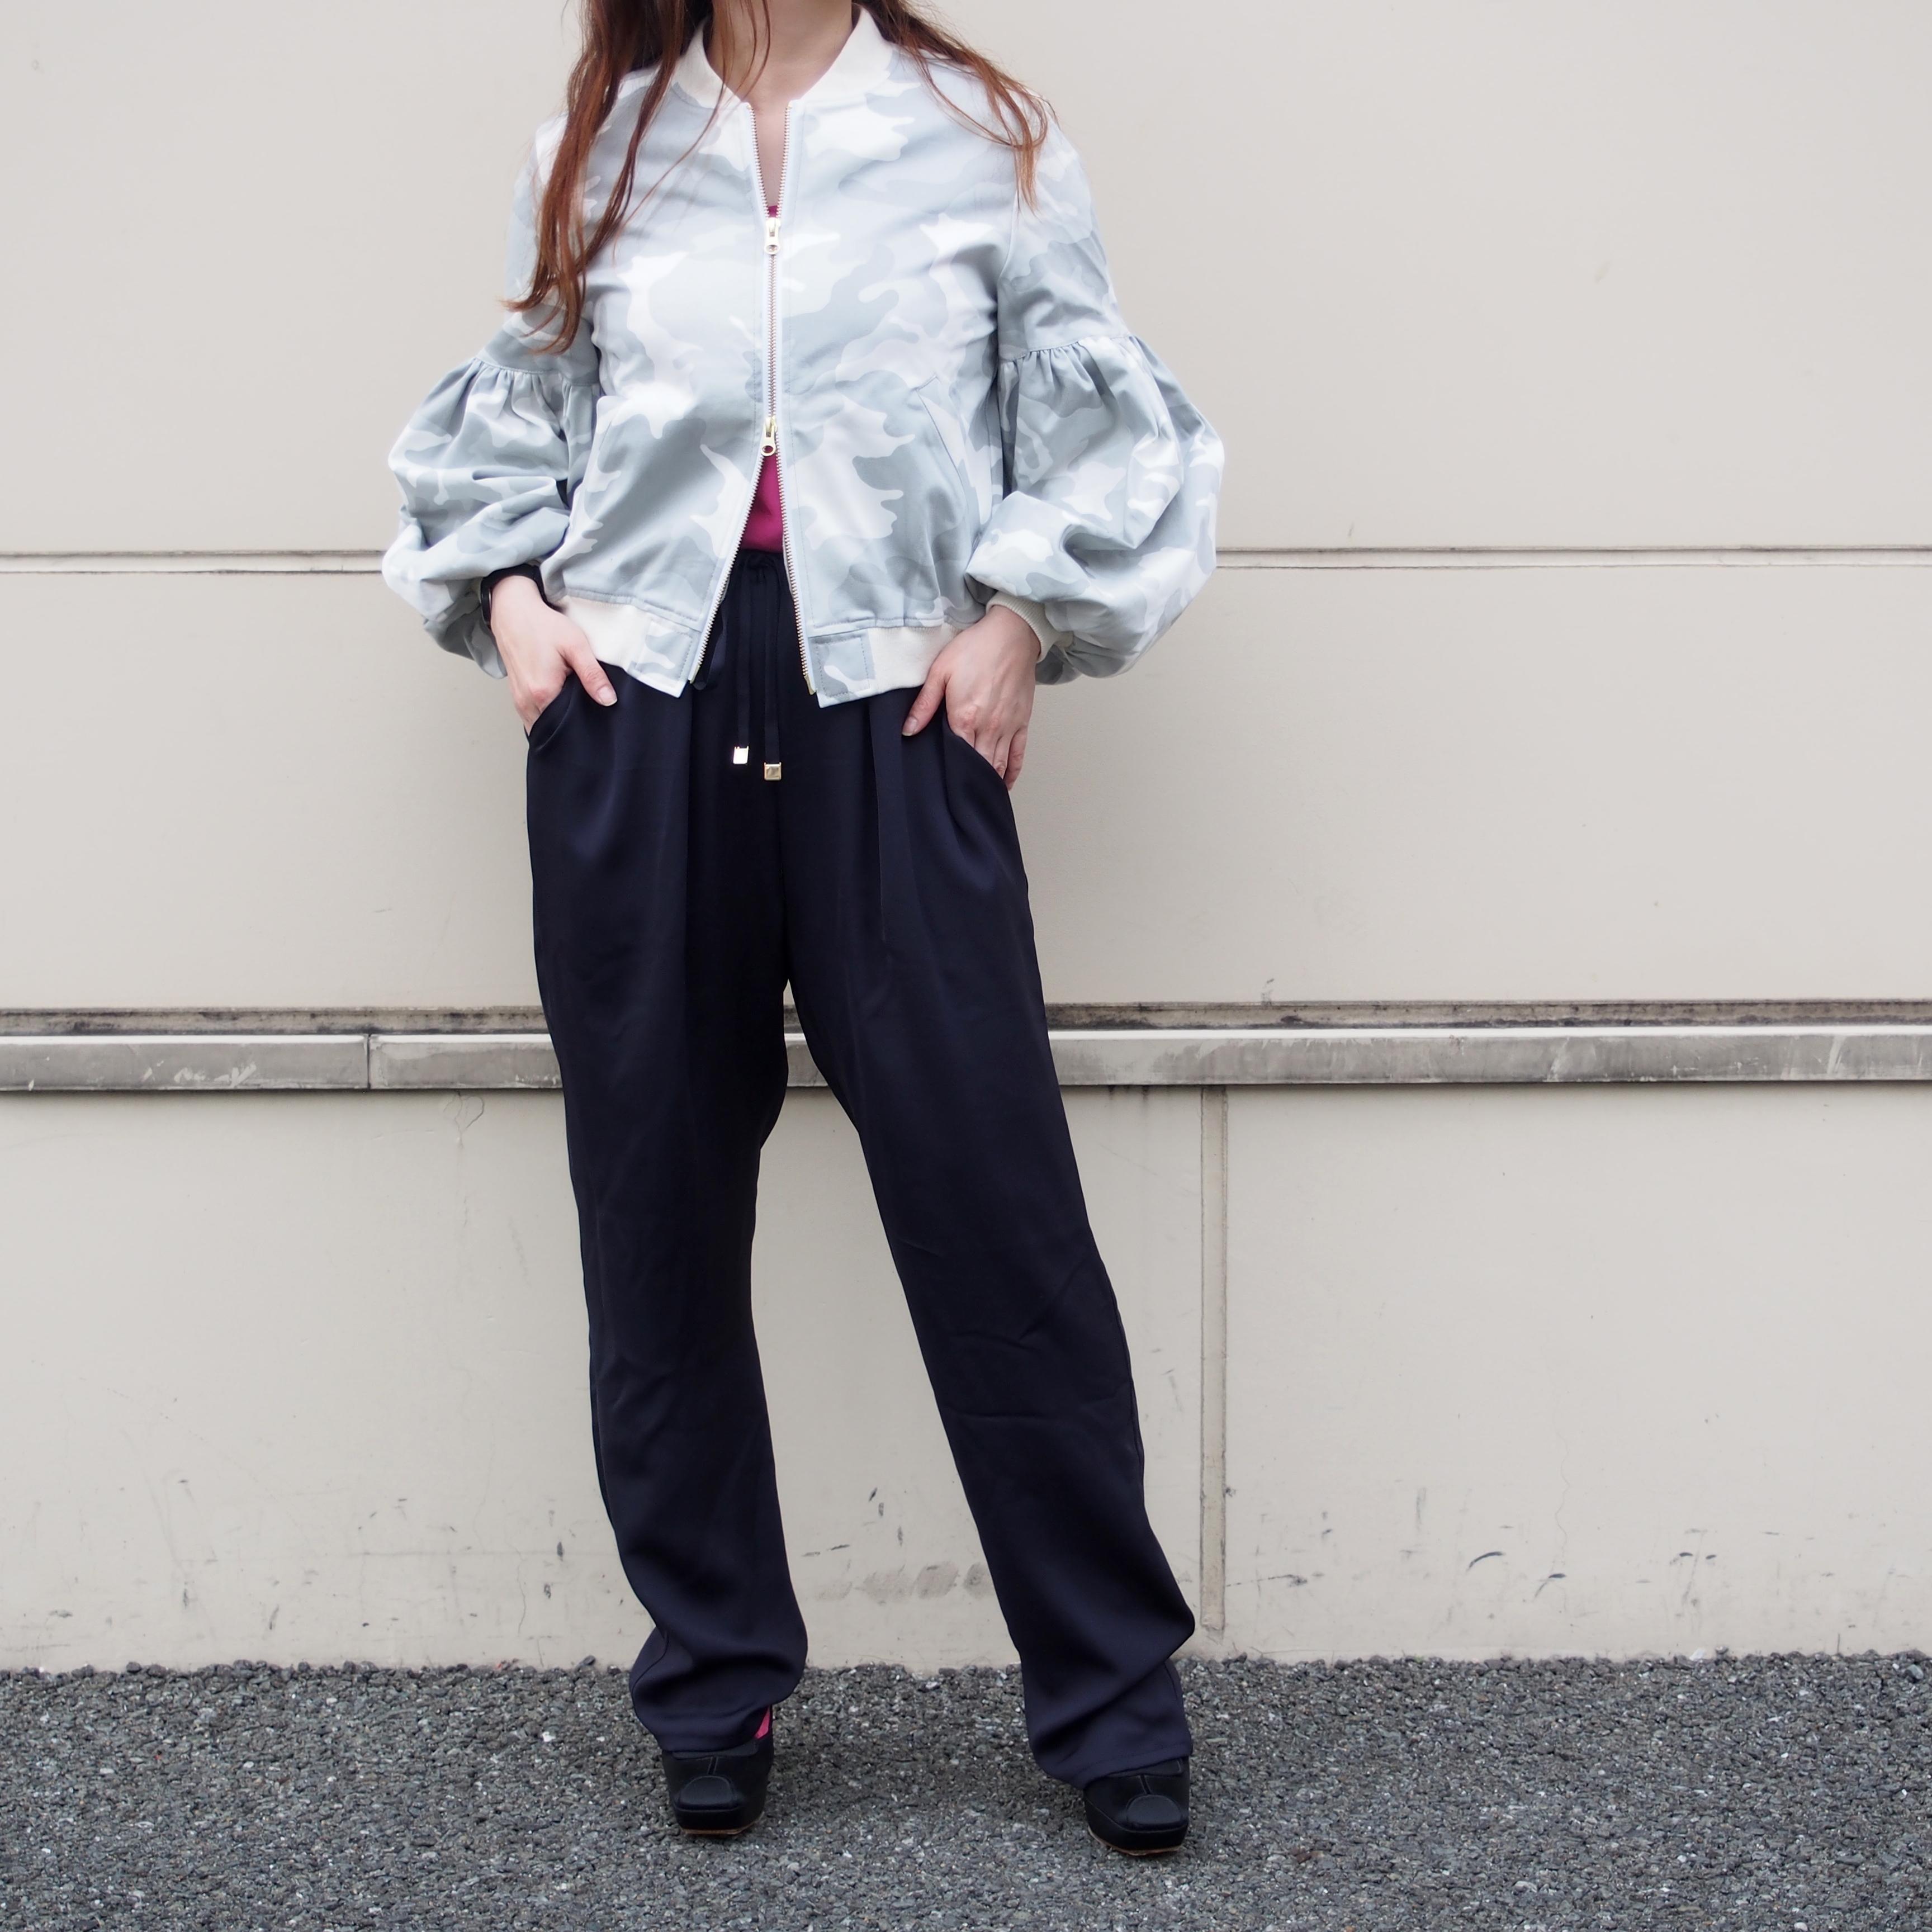 【ethical hippi】tapered pants(dark navy) / 【エシカル ヒッピ】テーパード パンツ(ダーク ネービー)